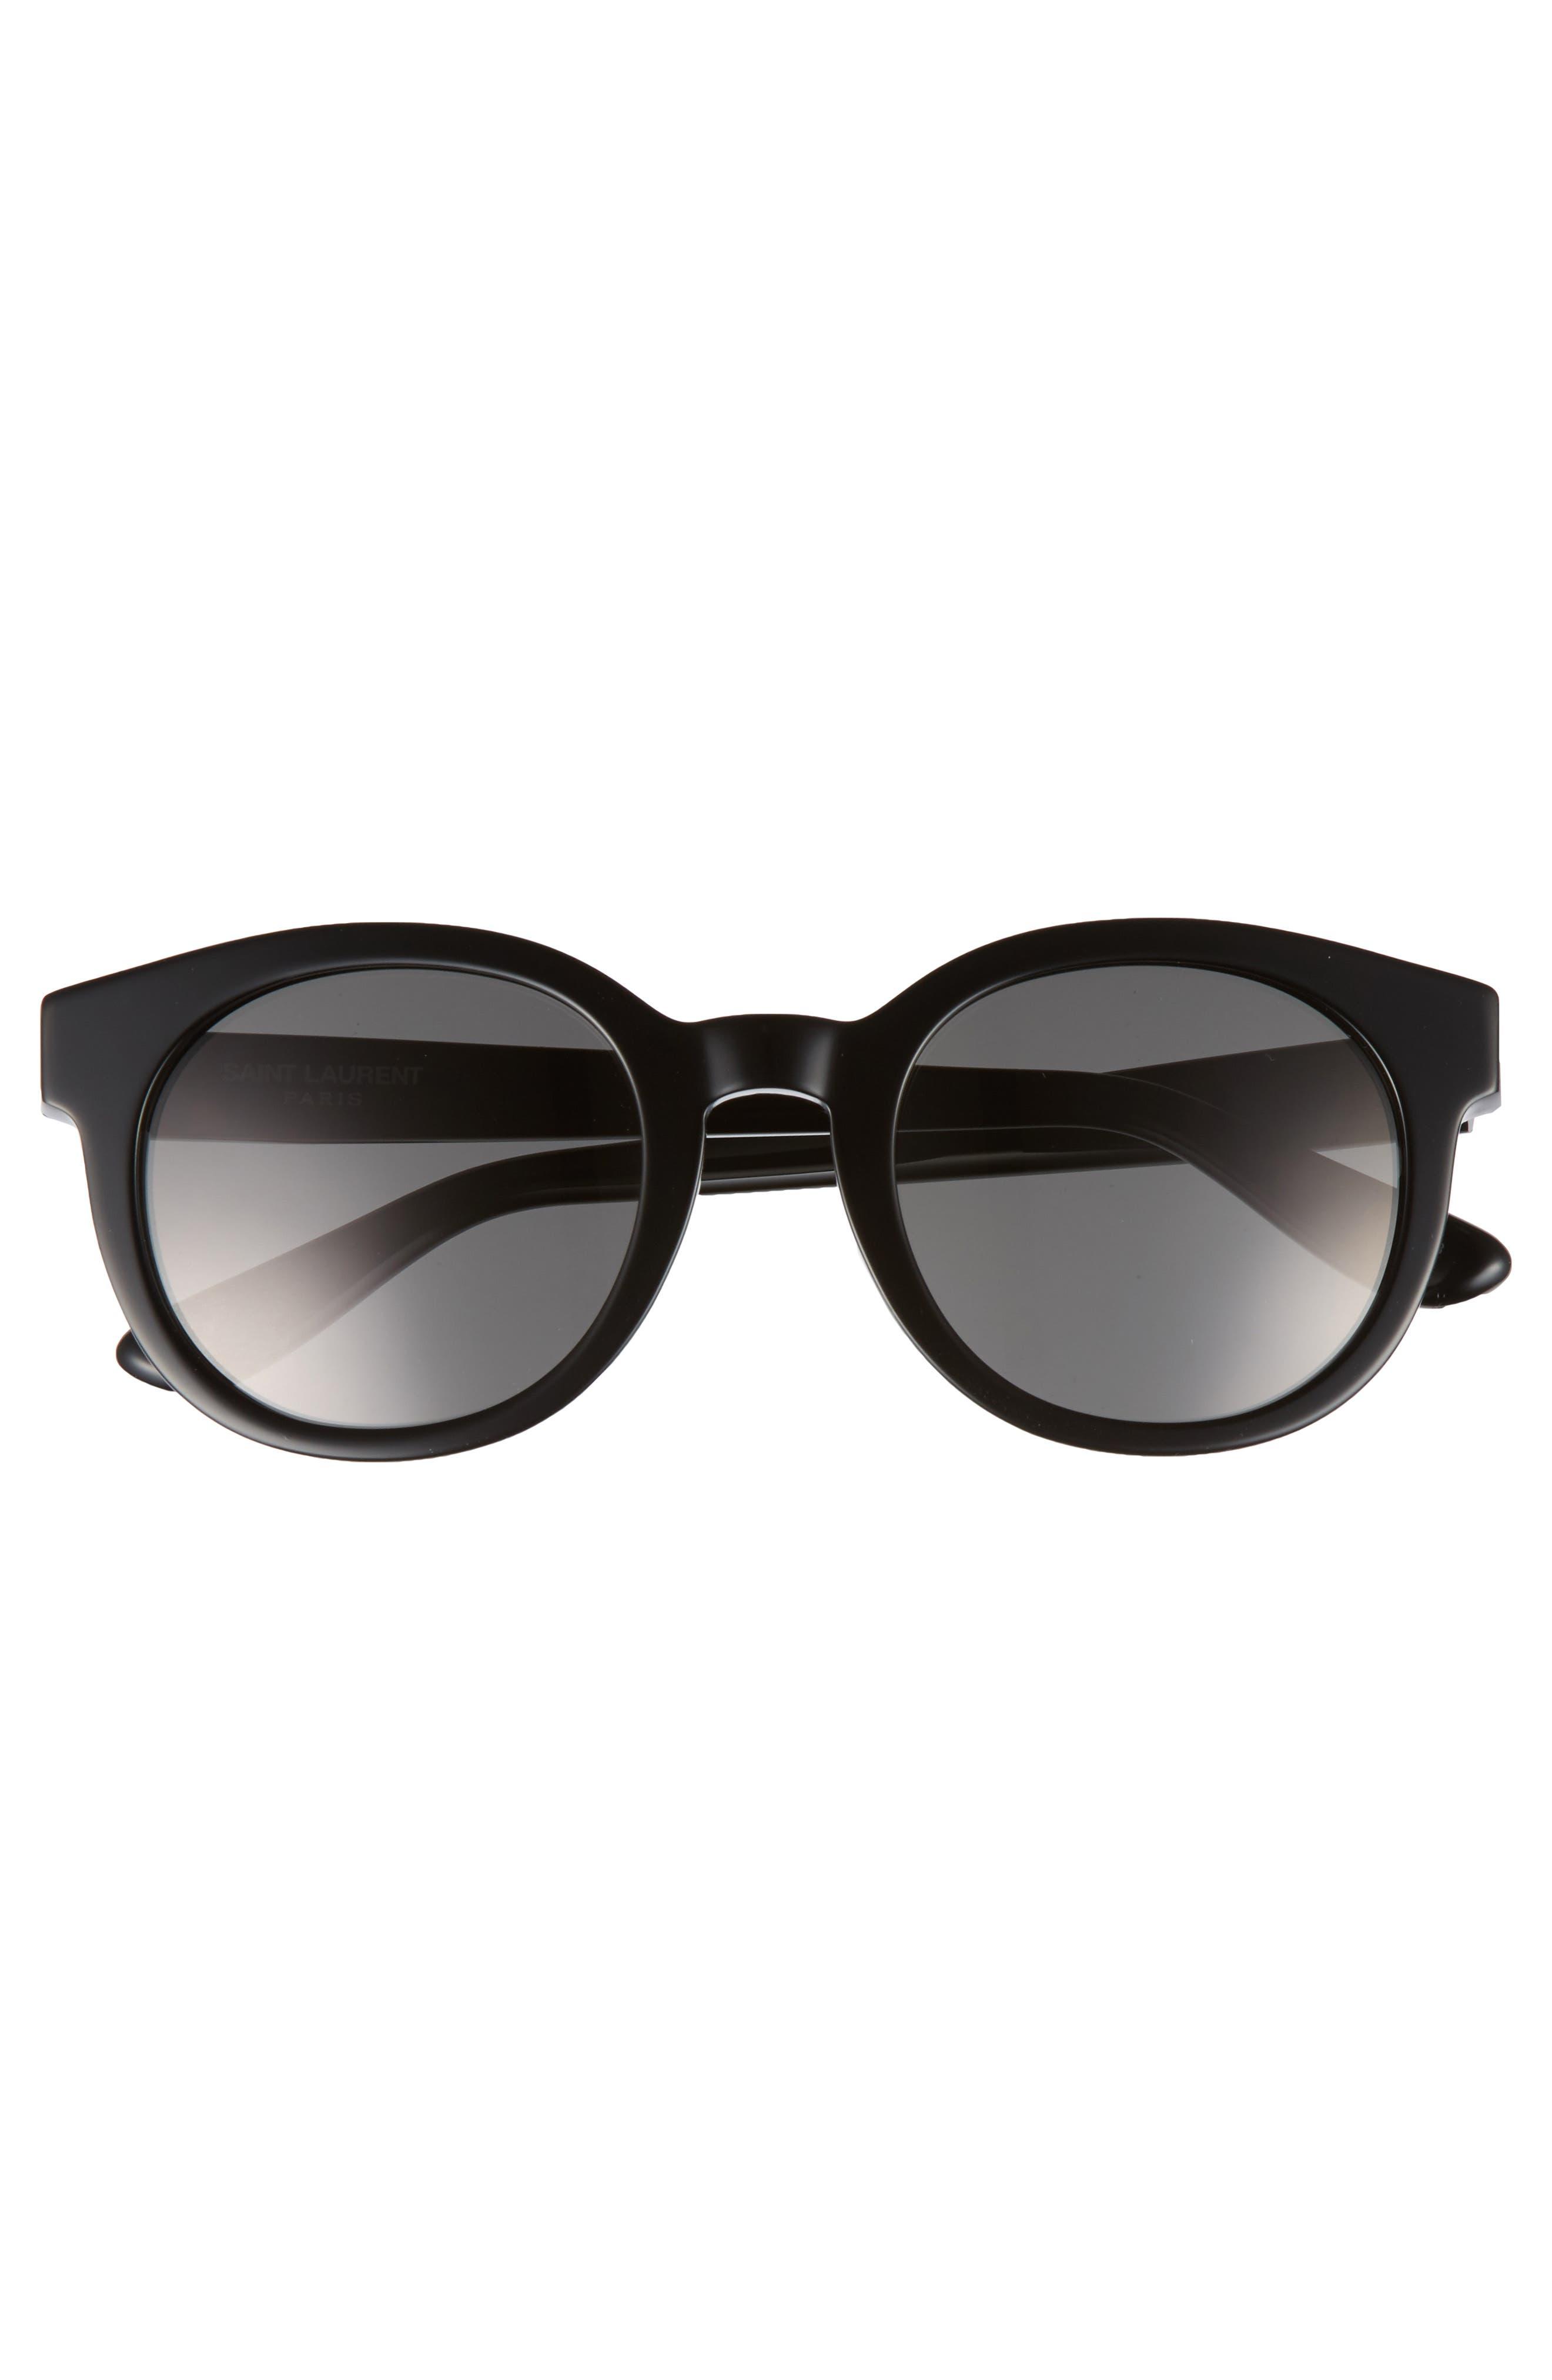 51mm Round Sunglasses,                             Alternate thumbnail 3, color,                             Black